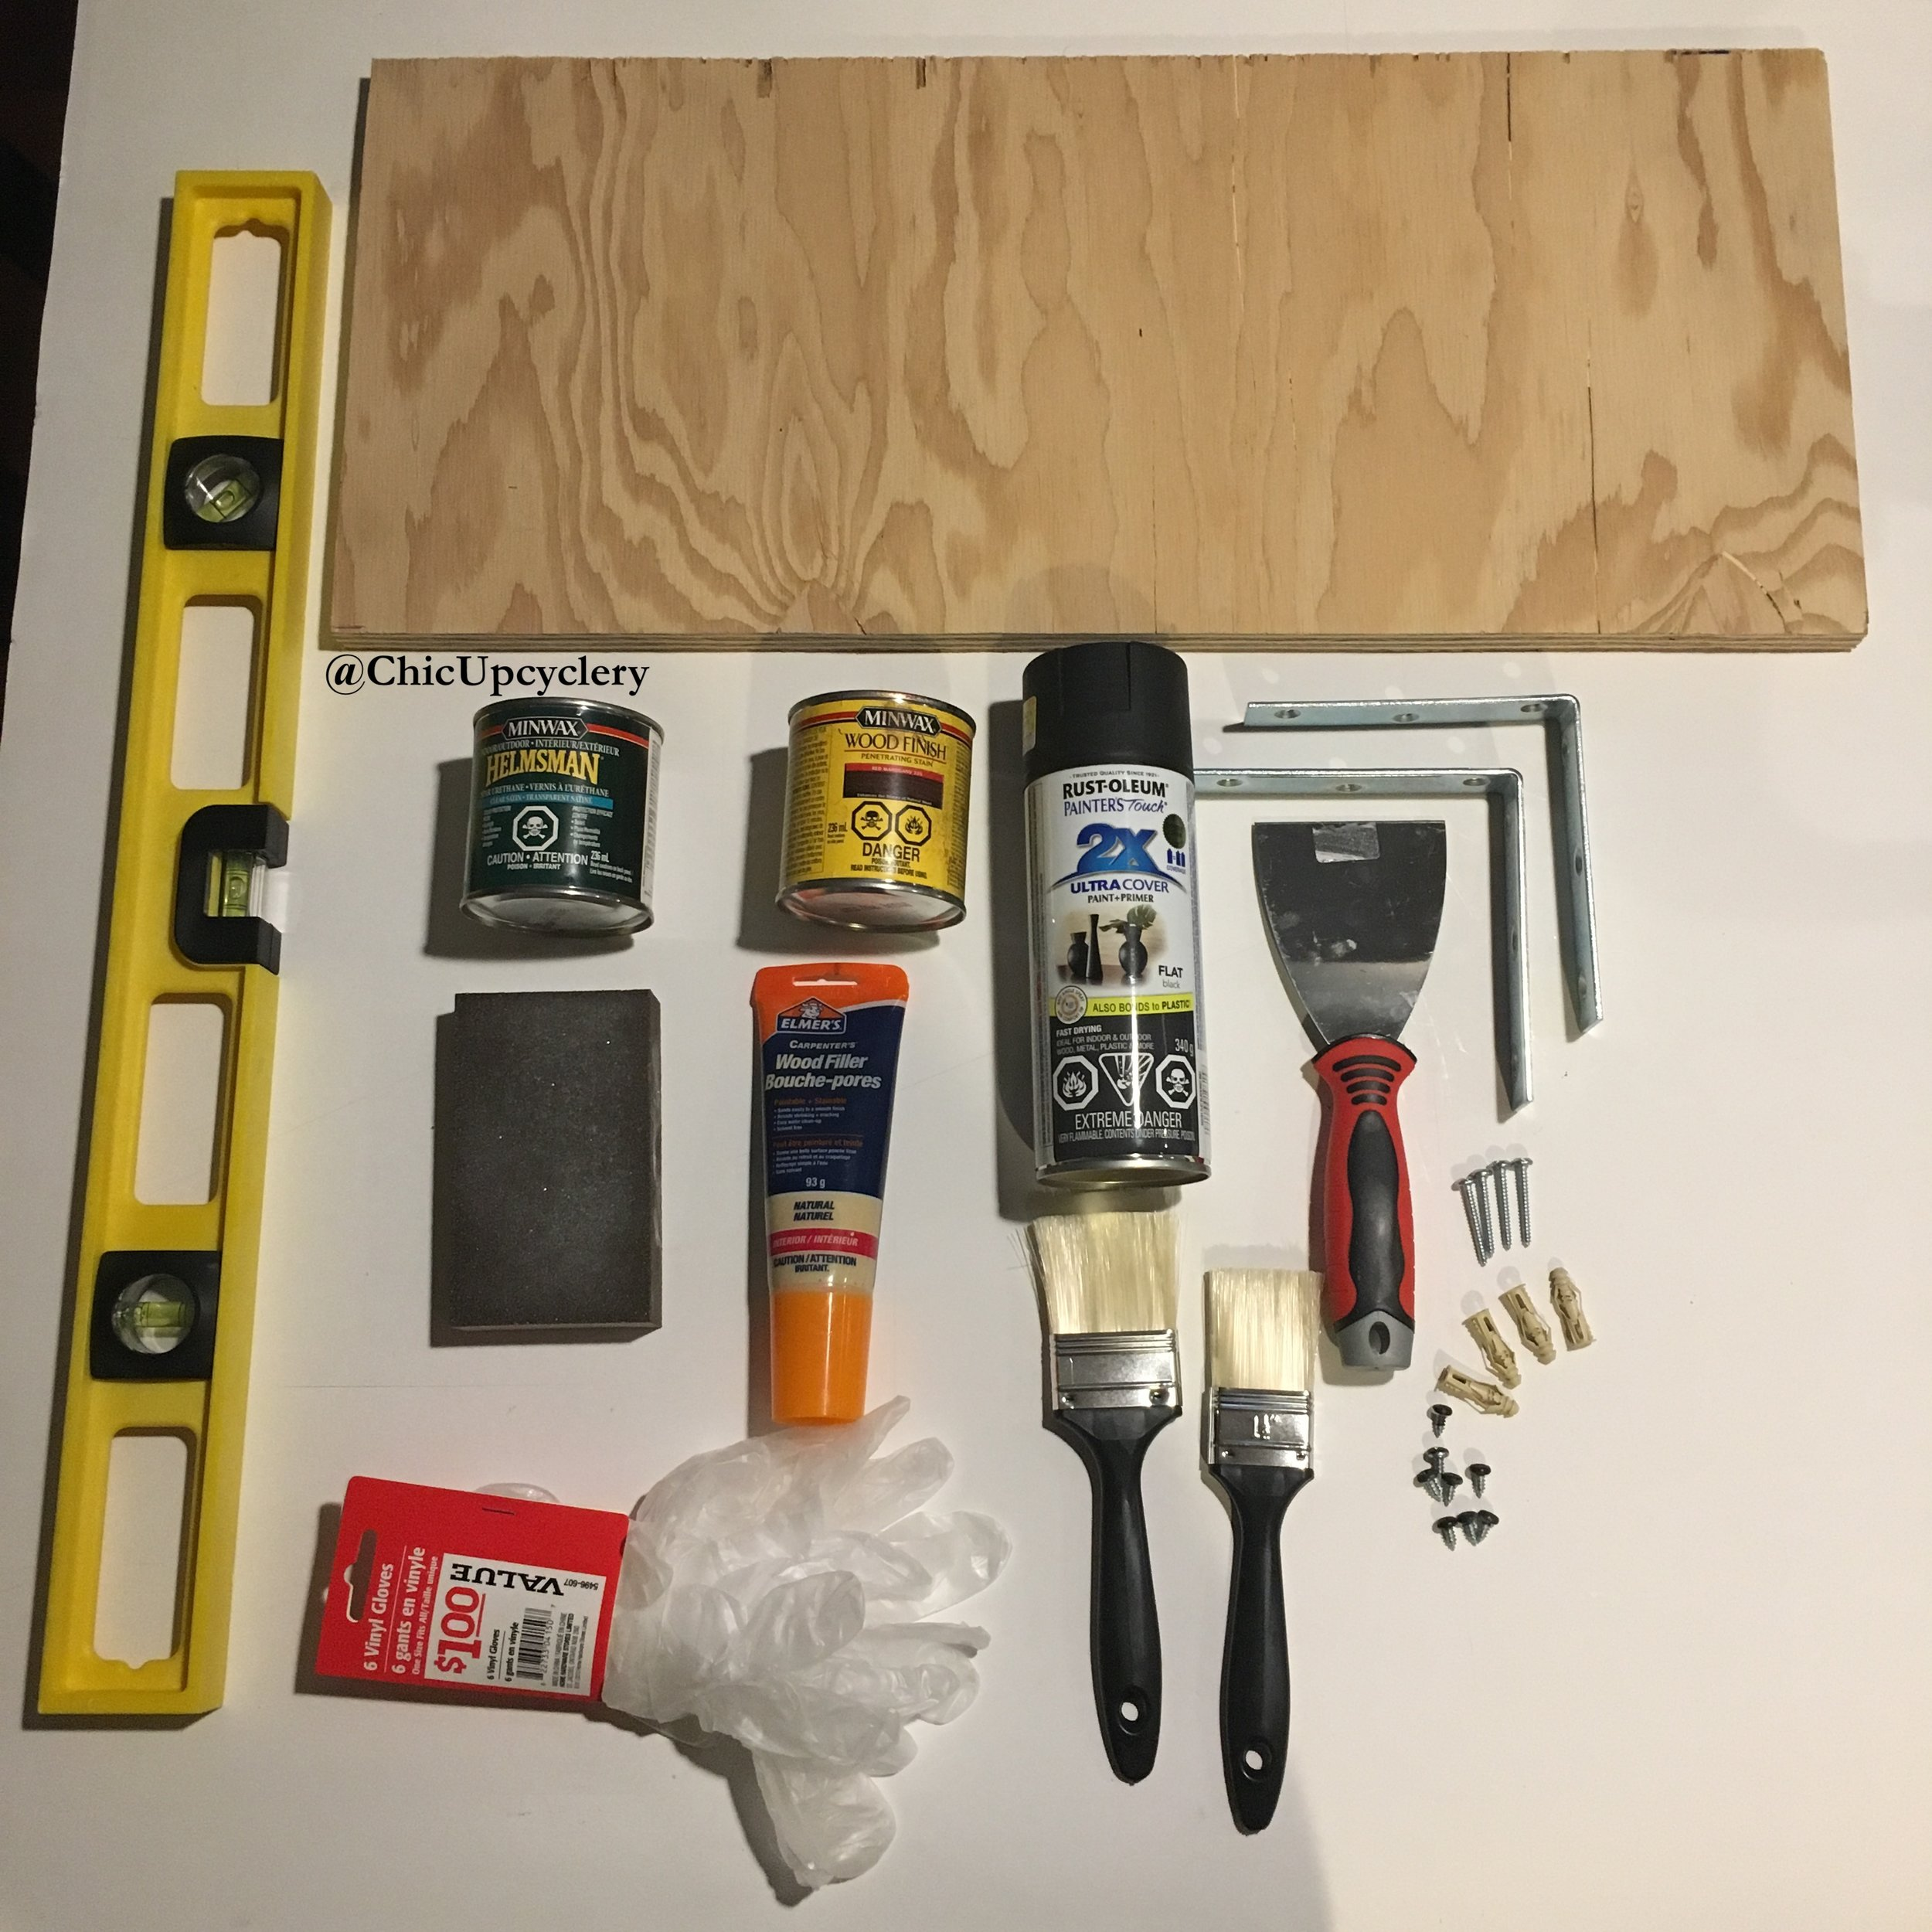 Level, Shelf, Wood Stain, Polyurethane Wood Sealer, Spray Paint, Corner Brackets, Sanding Block, Wood Filler, Putty Knife, Gloves, Paint Brushes, Dry Wall Anchors, Screws